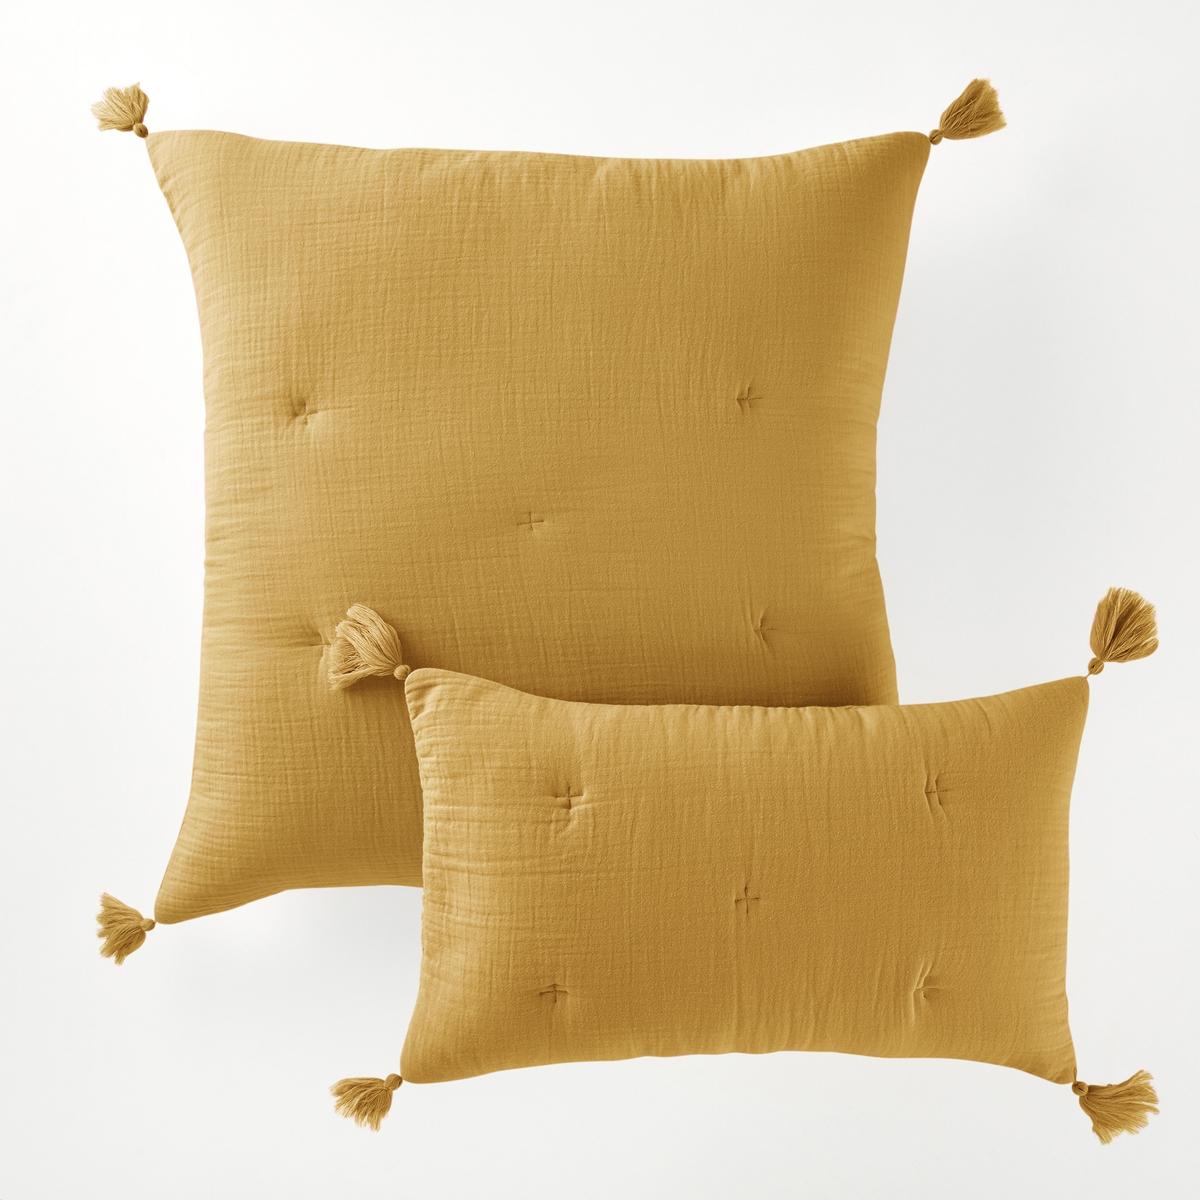 Наволочка / чехол на подушку-валик, KUMLA цена